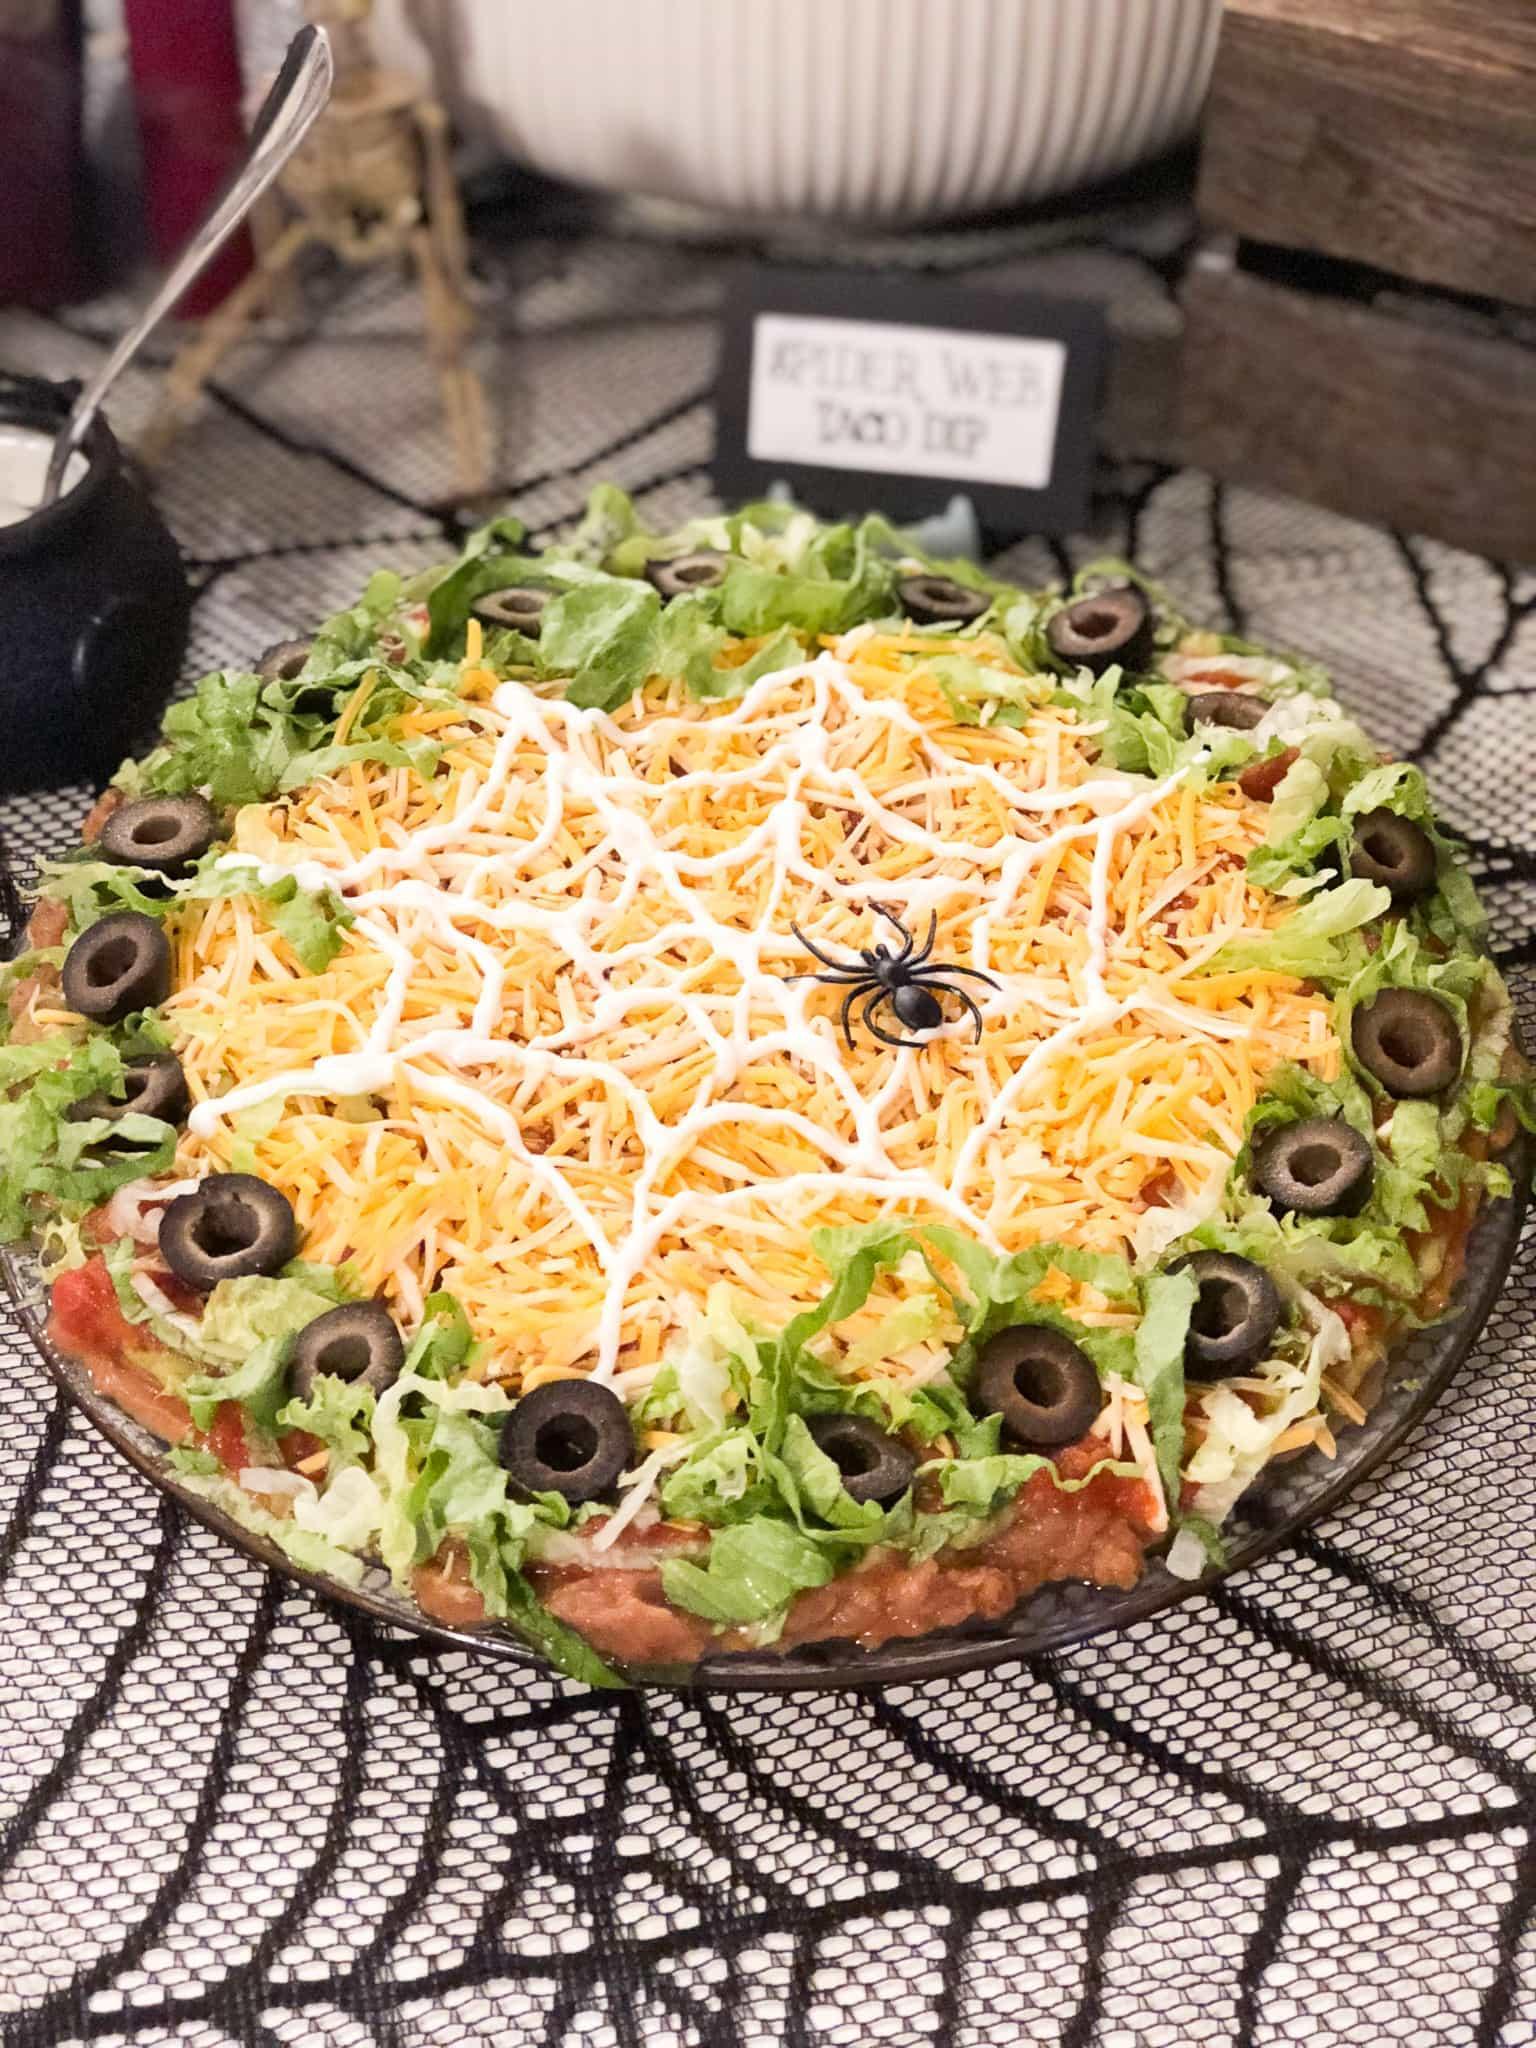 olives on pizza